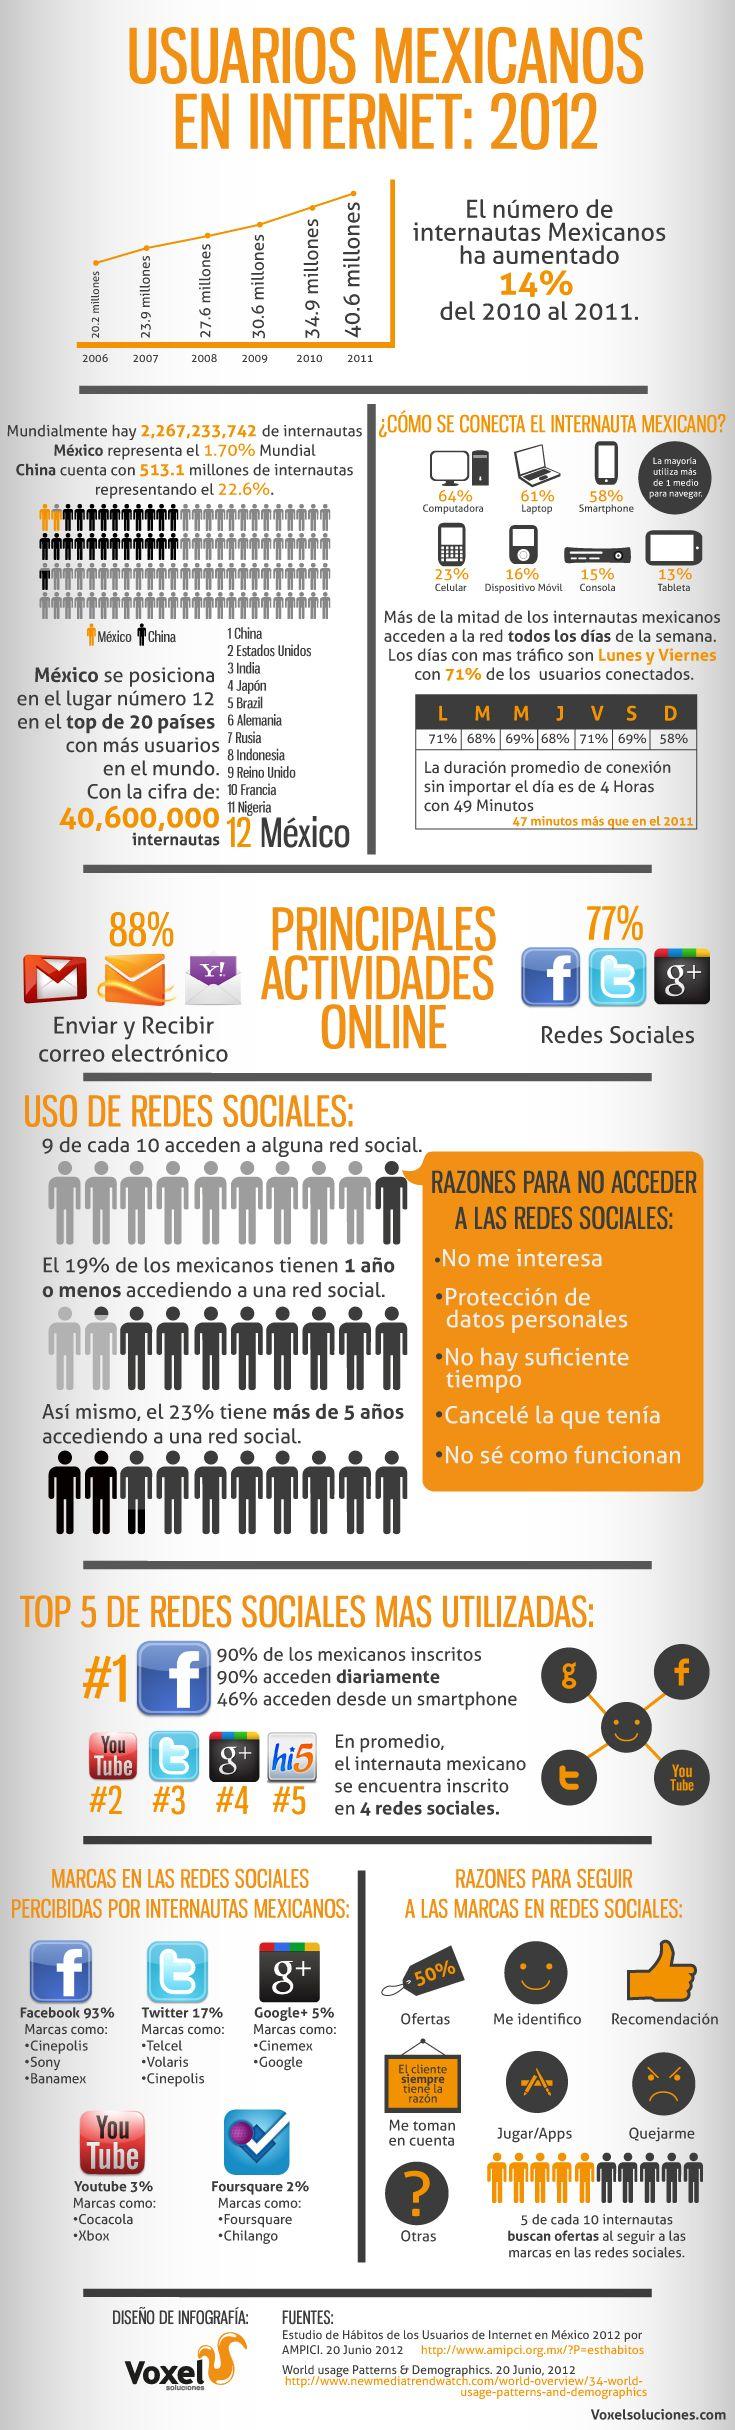 Usuarios mexicanos en Internet 2012